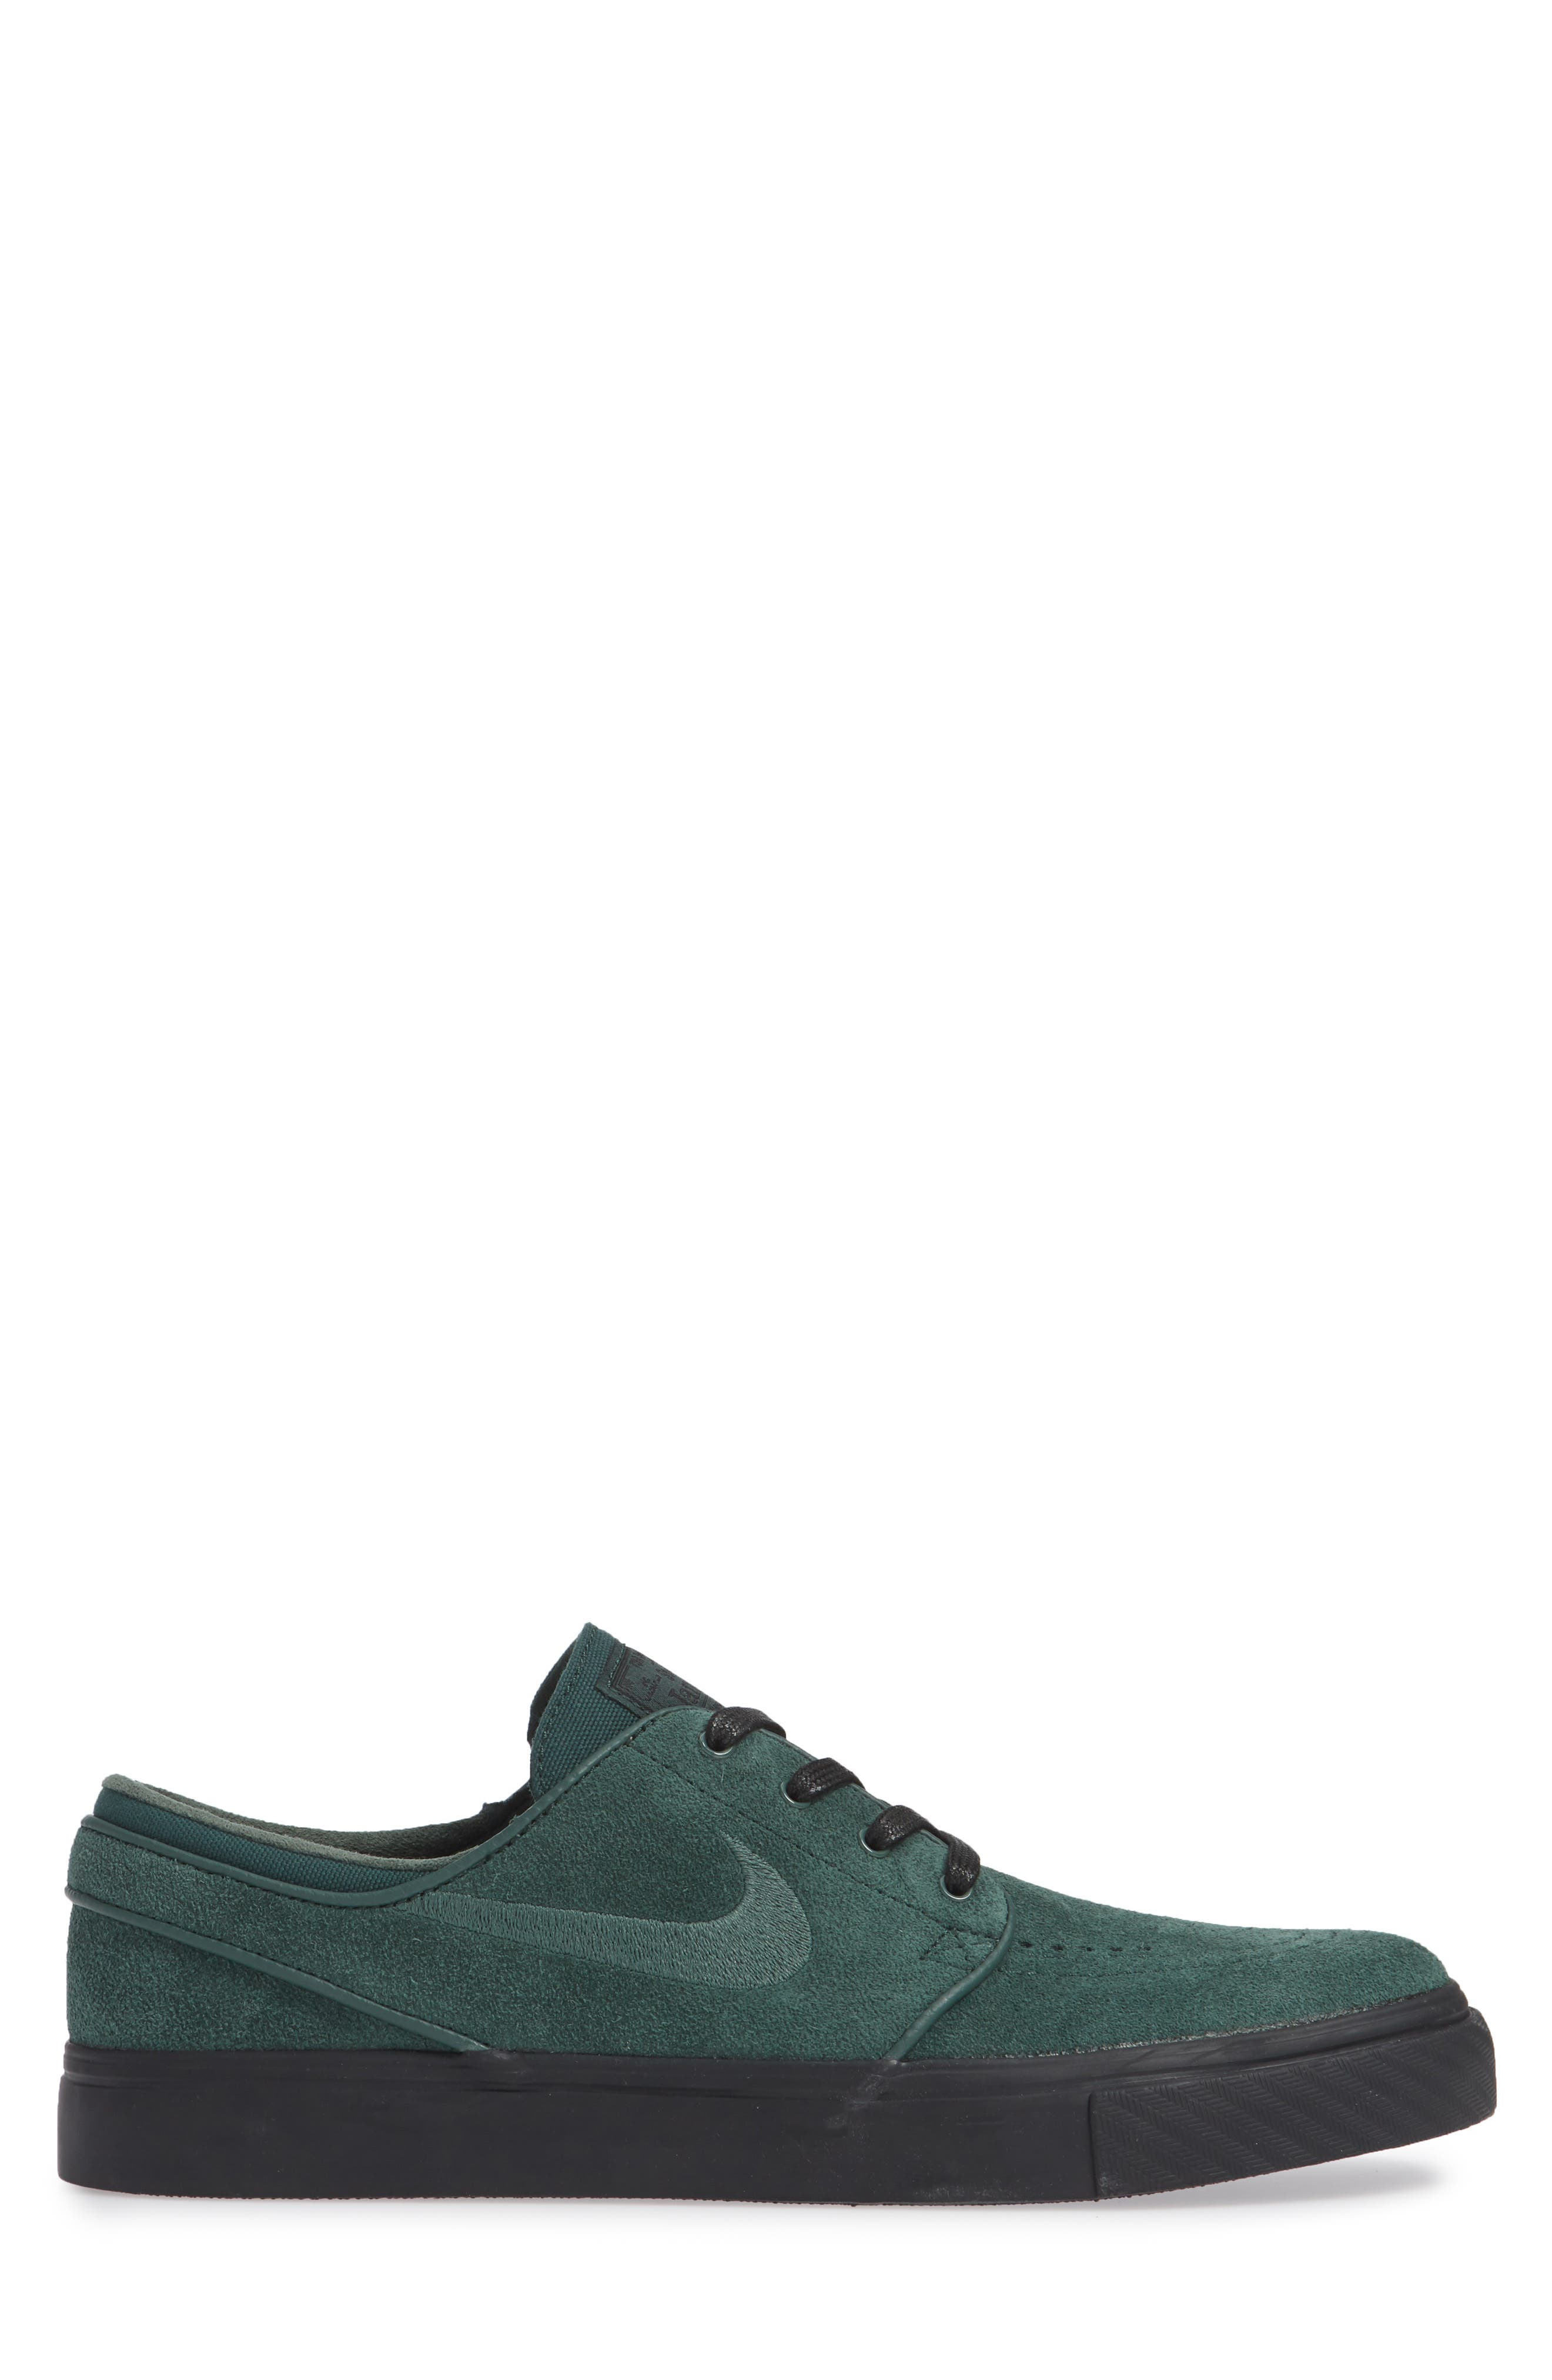 'Zoom - Stefan Janoski' Skate Shoe,                             Alternate thumbnail 5, color,                             Midnight Green/ Black